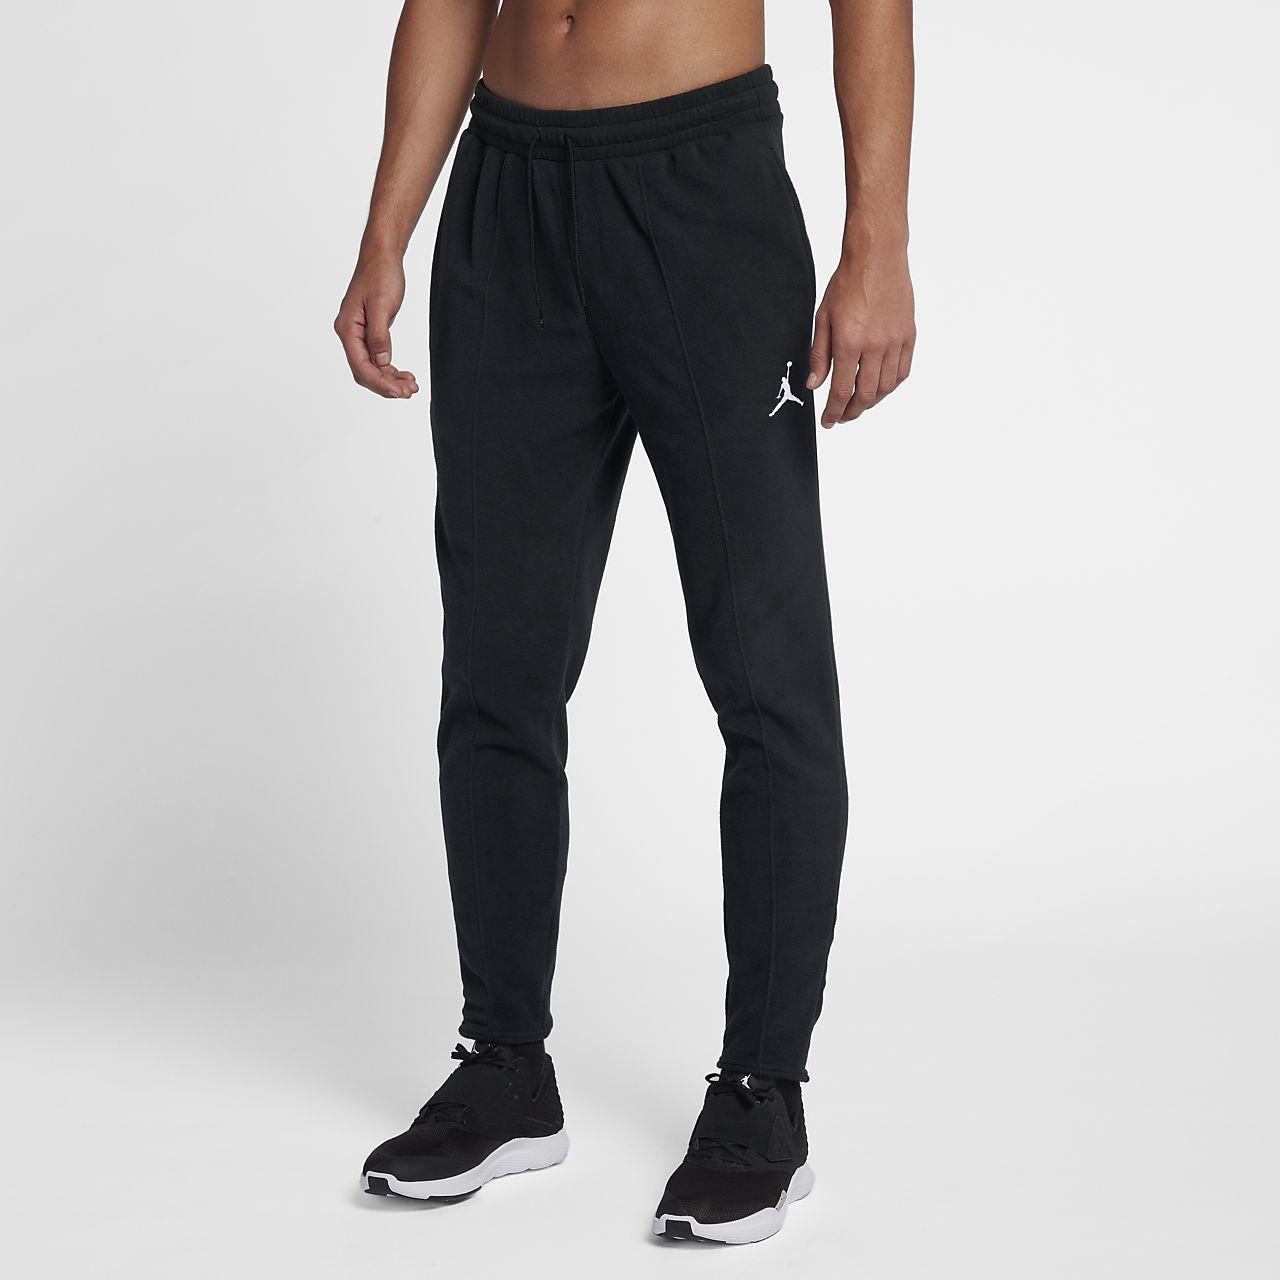 Pánské tréninkové kalhoty Jordan Therma 23 Alpha. Nike.com CZ 3a3c0b26cd3